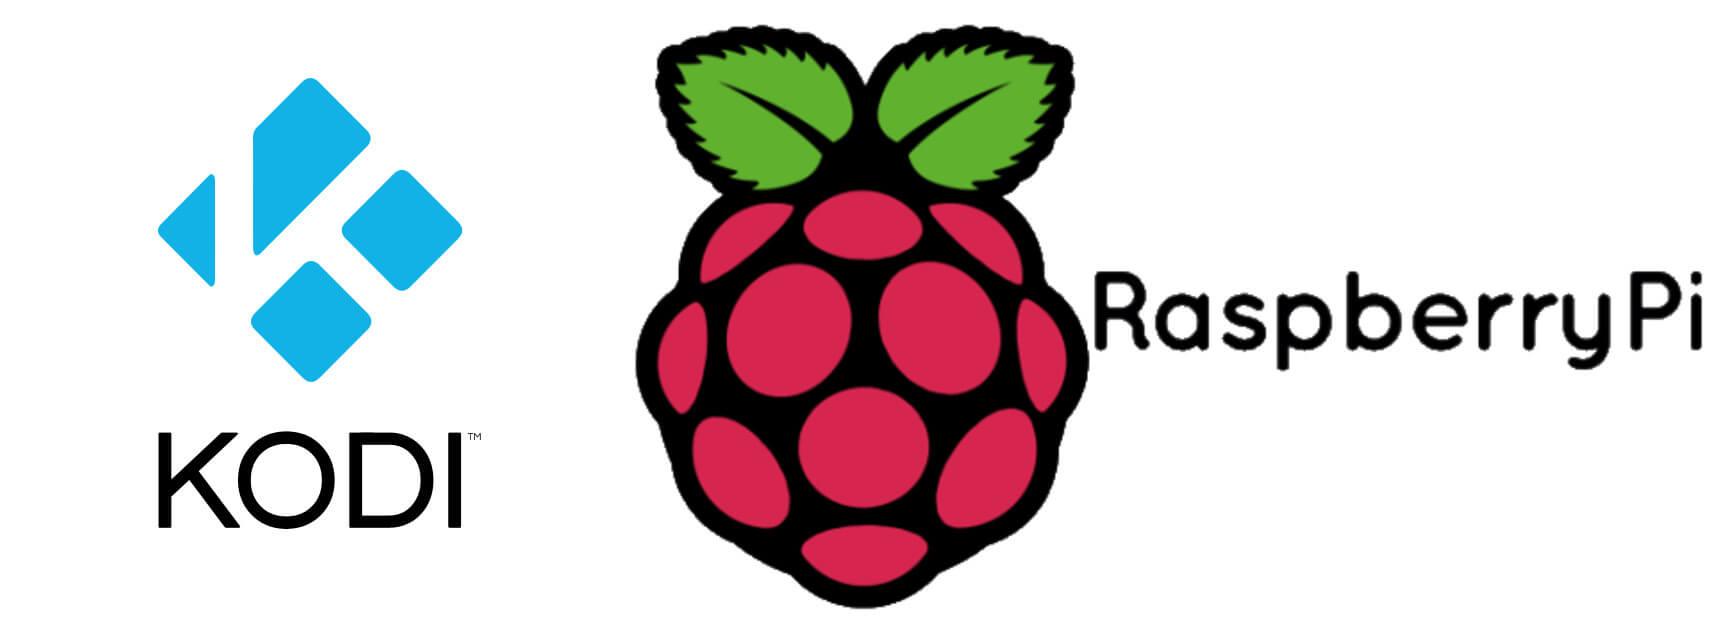 How to use kodi on raspberry pi 3